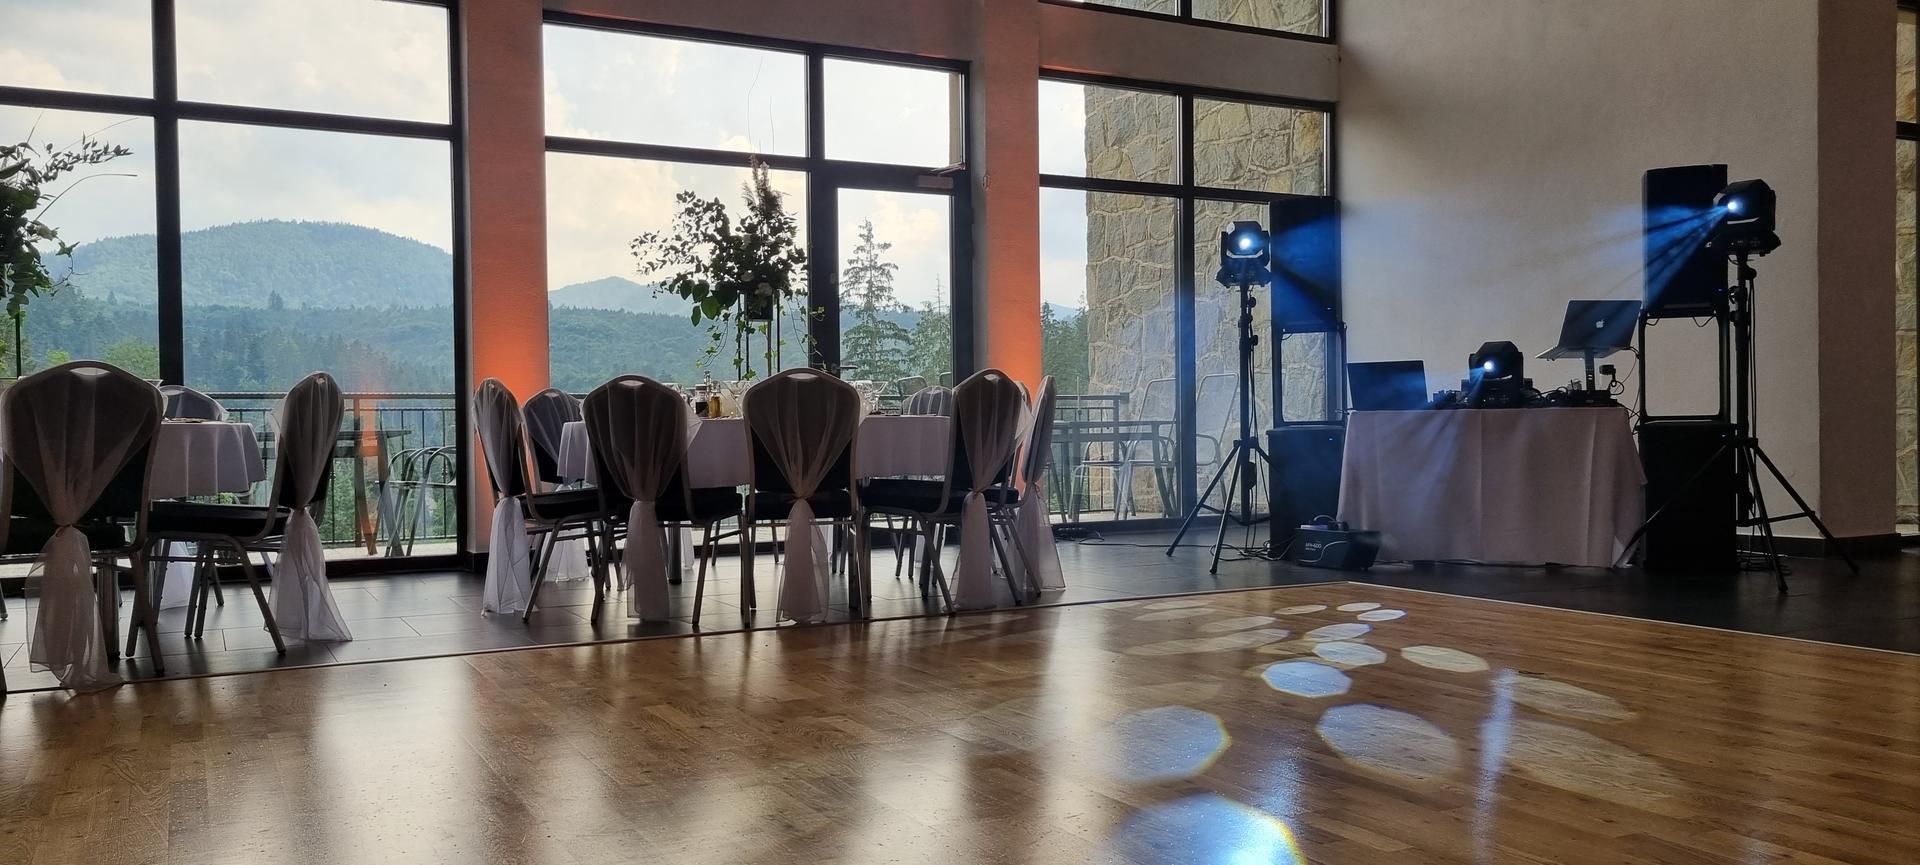 martin_martinkovic - Svadba Grand hotel Spiš